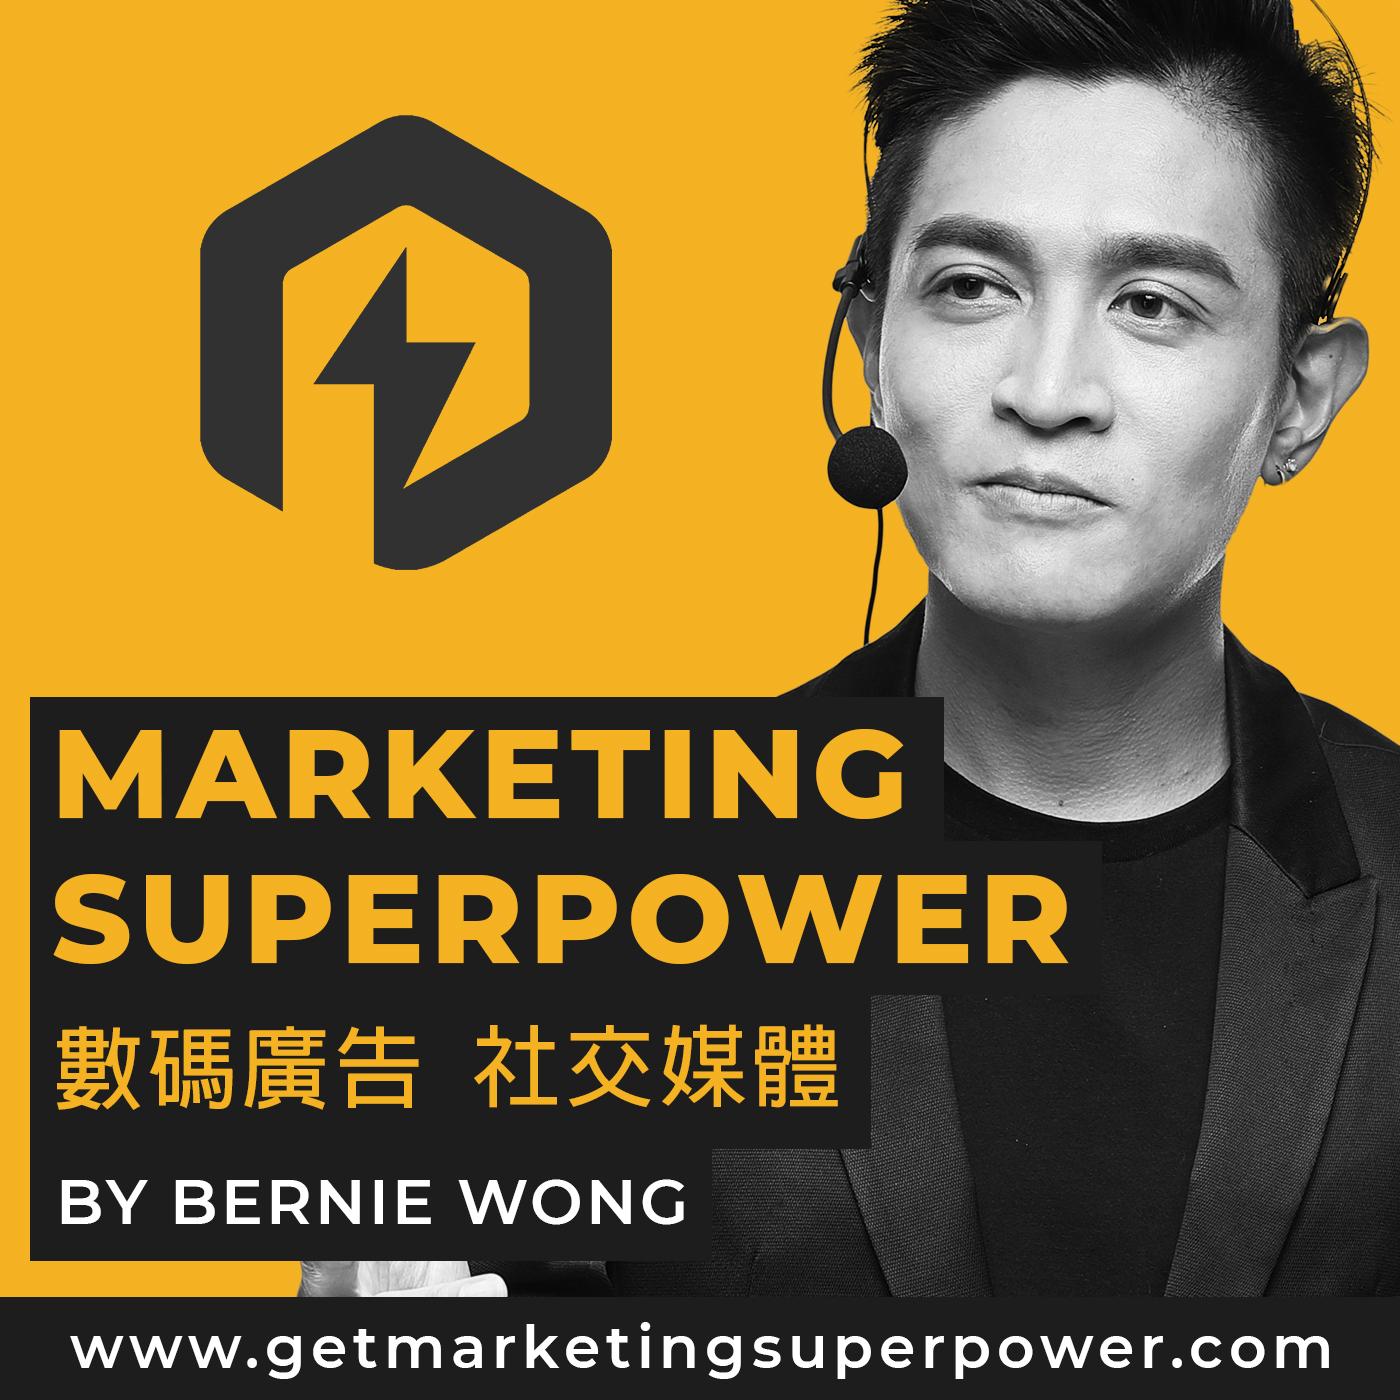 Marketing Superpower 數碼廣告 社交媒體營銷 show art